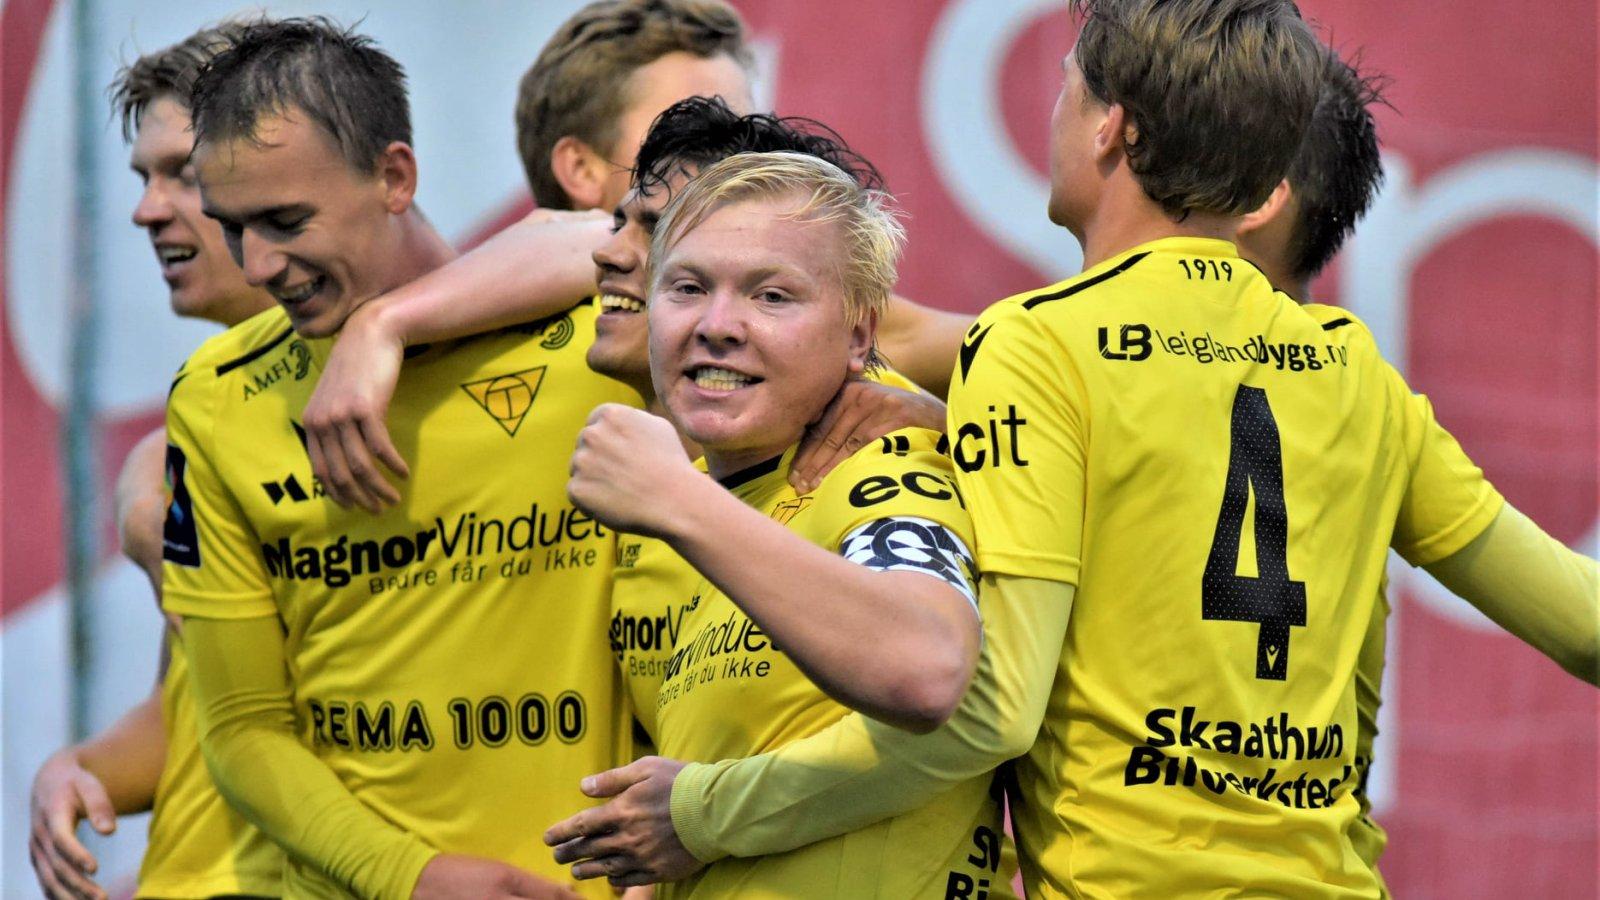 Foto: Trond Gausemel, Hordalandsfotball